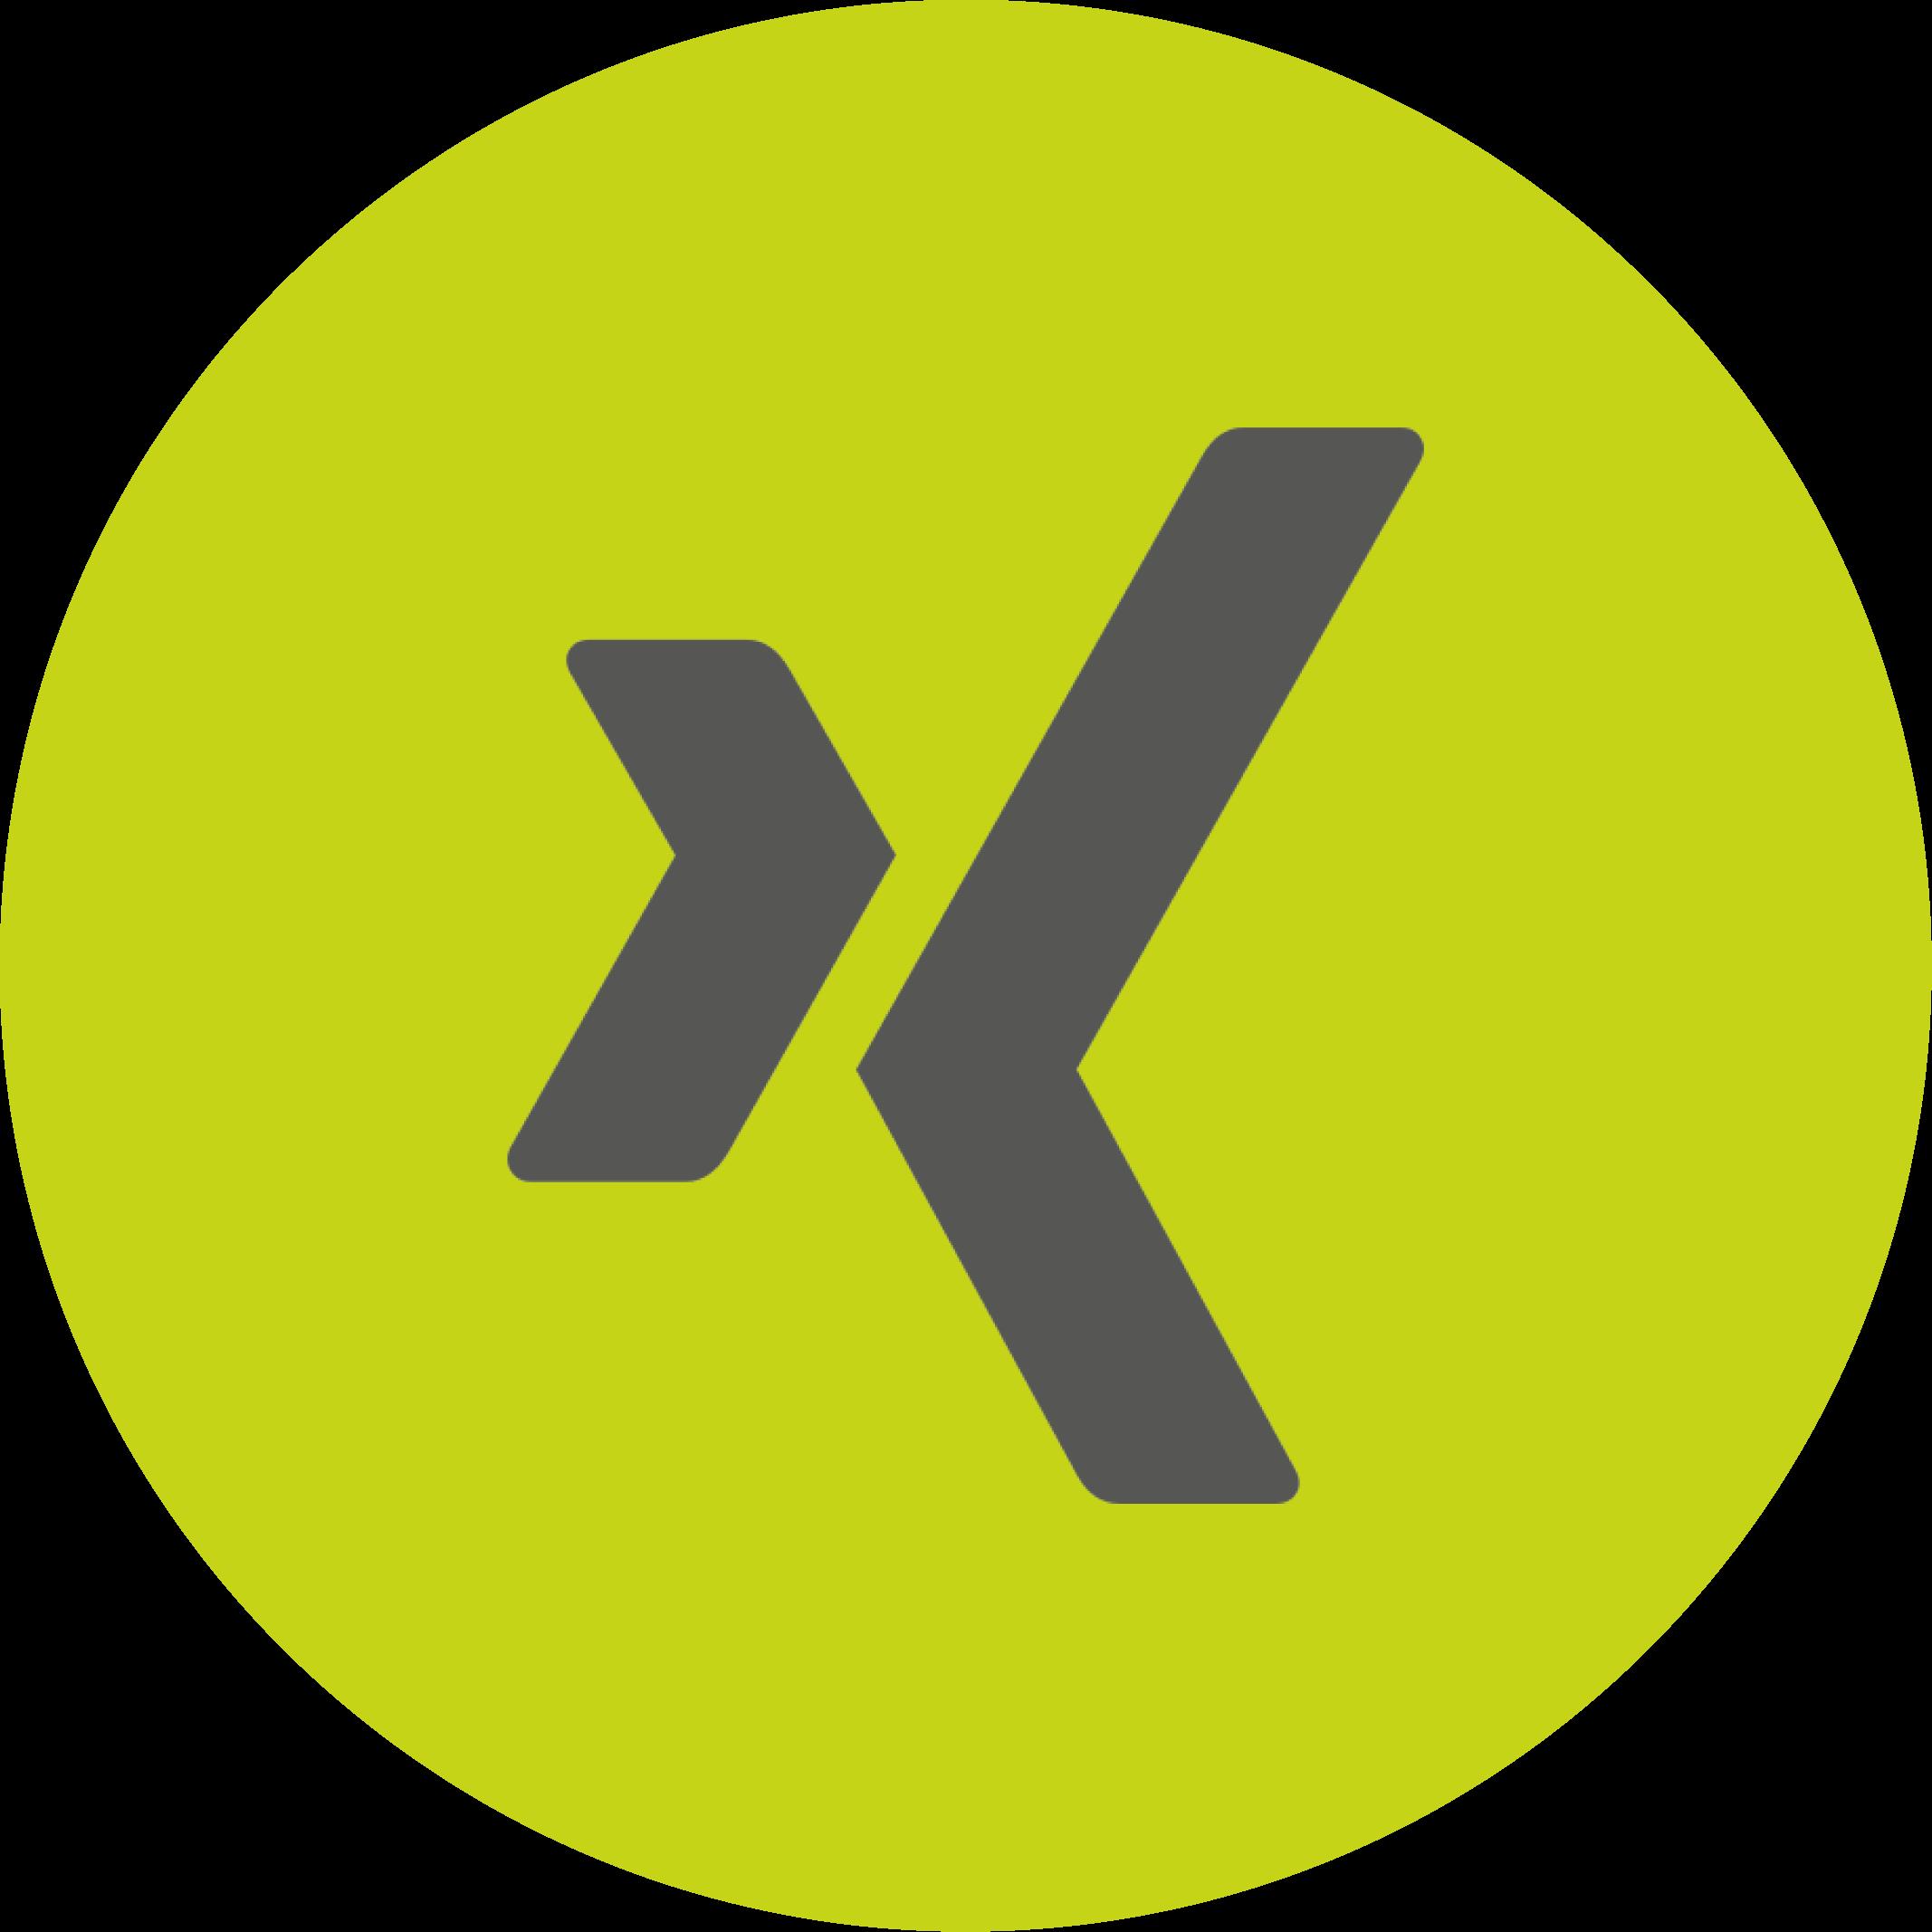 xing_logo_new512